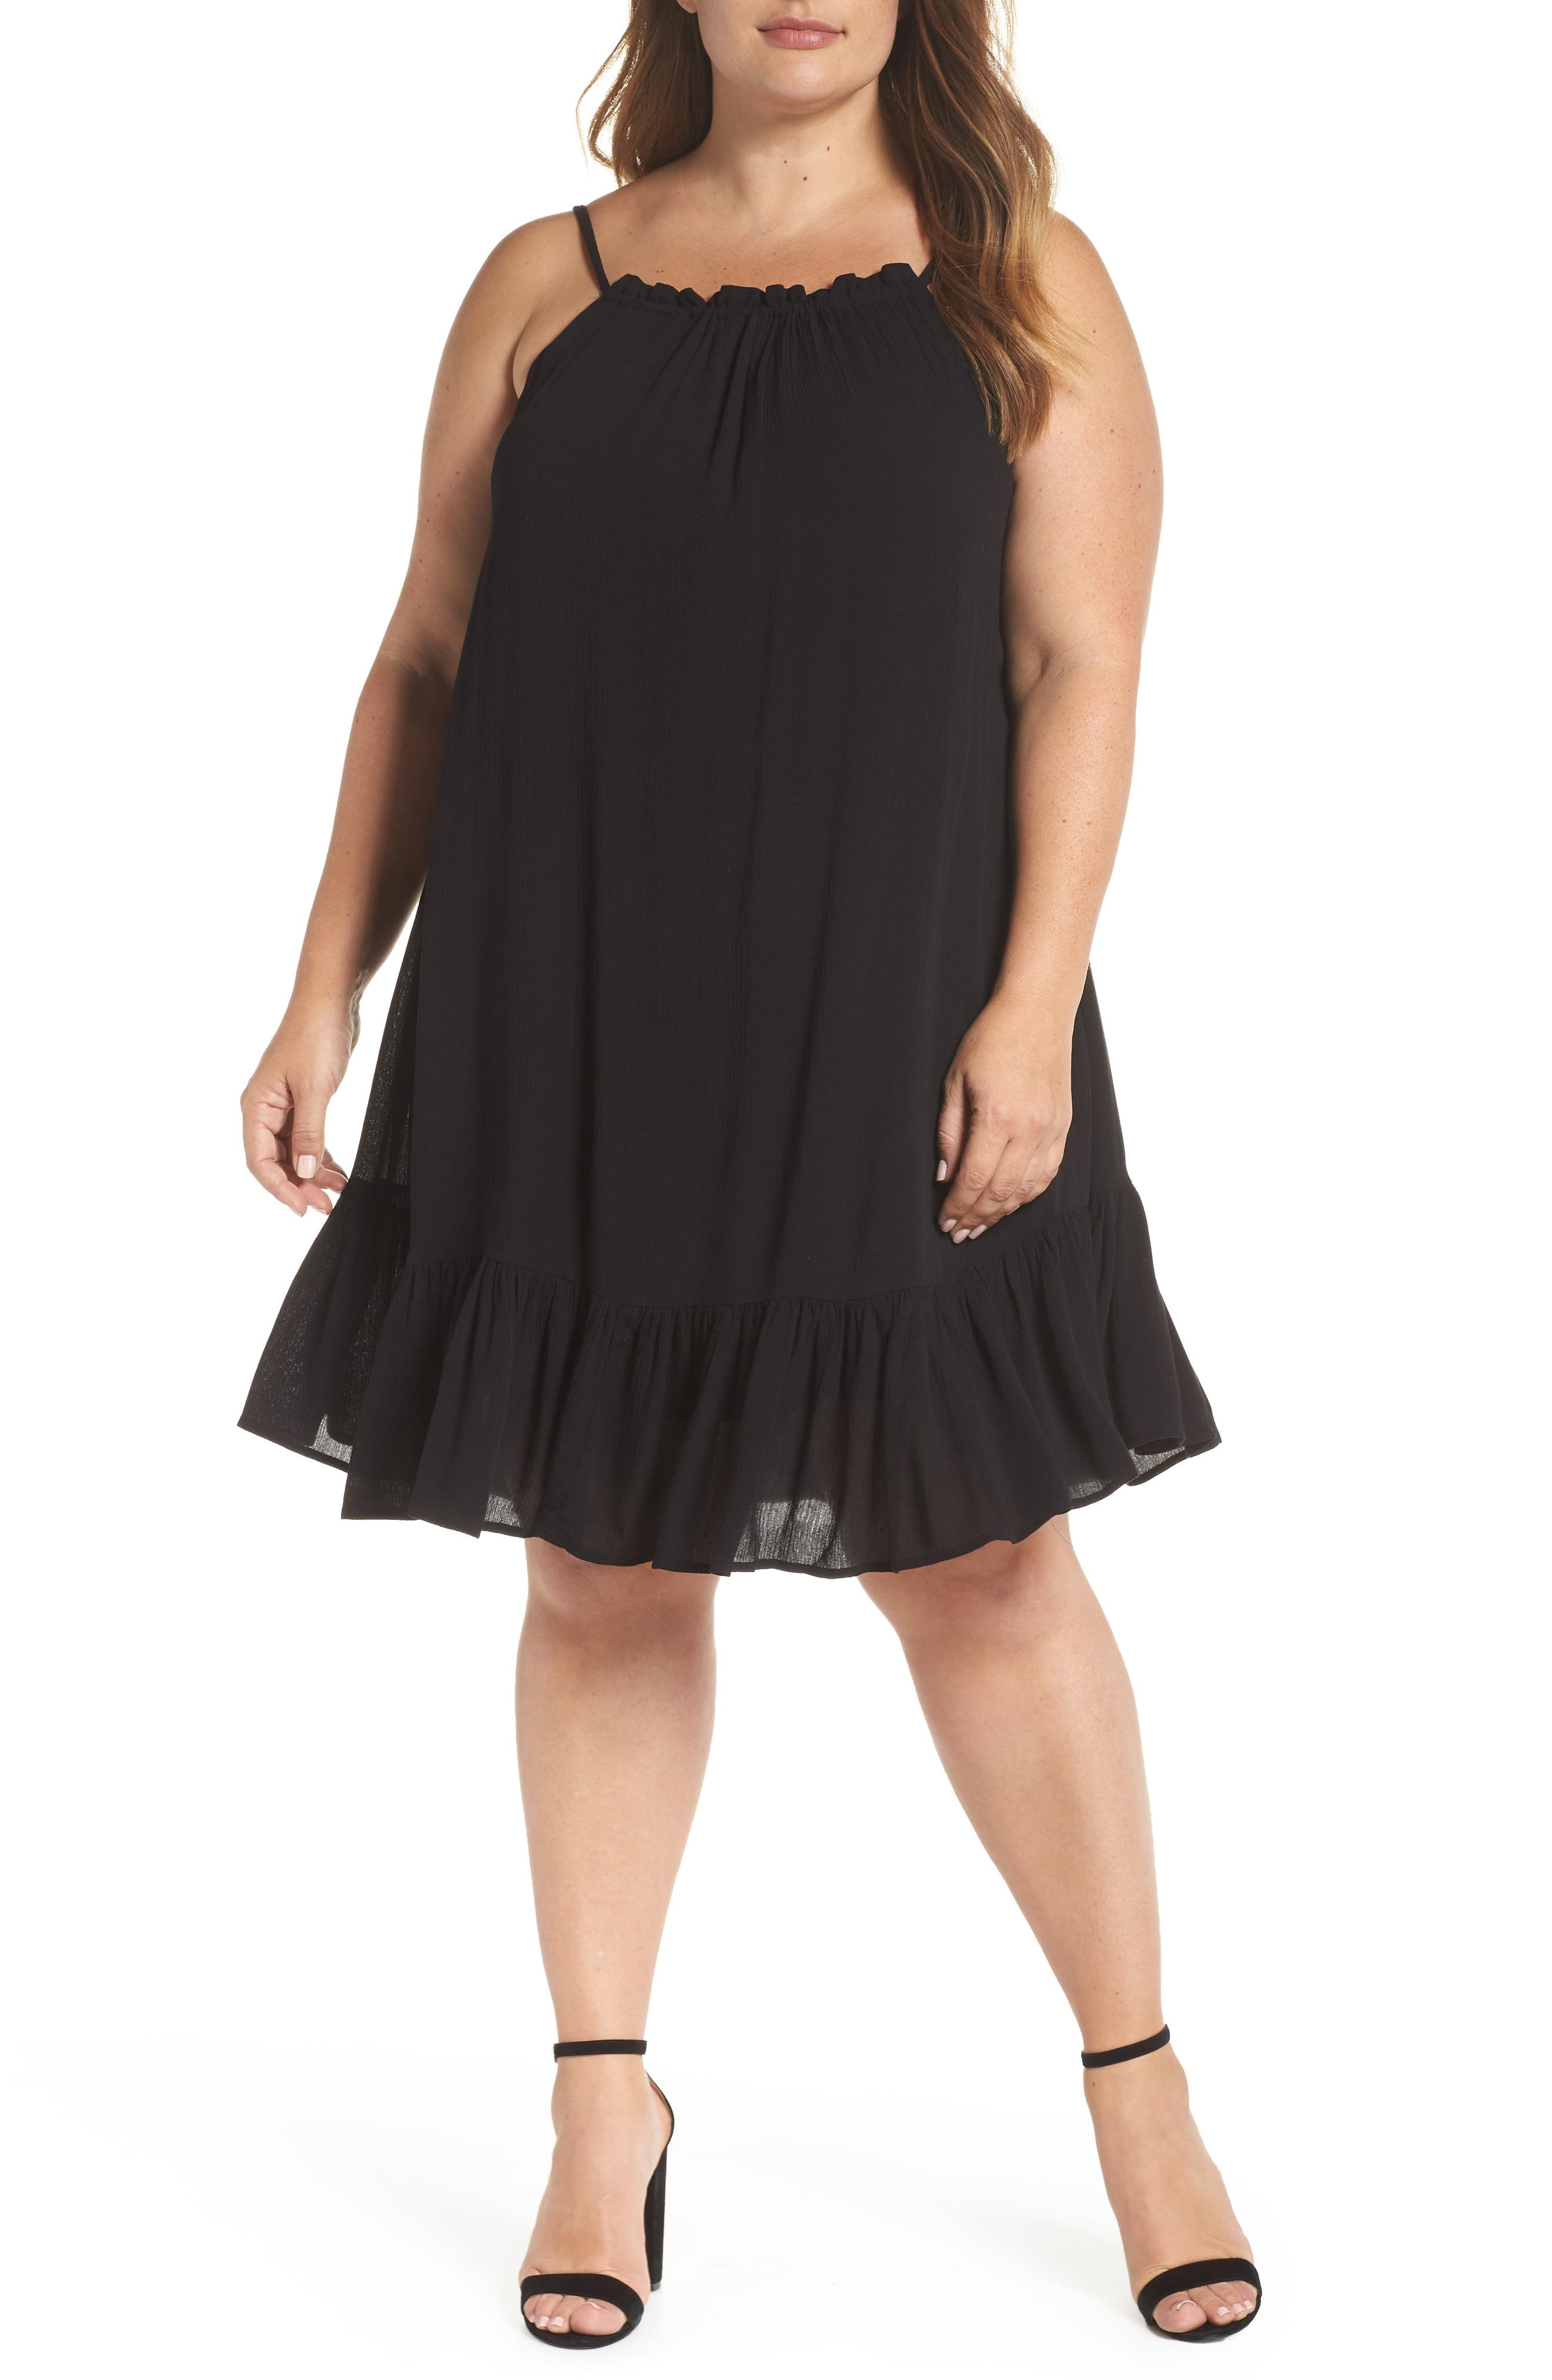 Liz Halter Top Baby Doll Dress,                             Main thumbnail 1, color,                             001